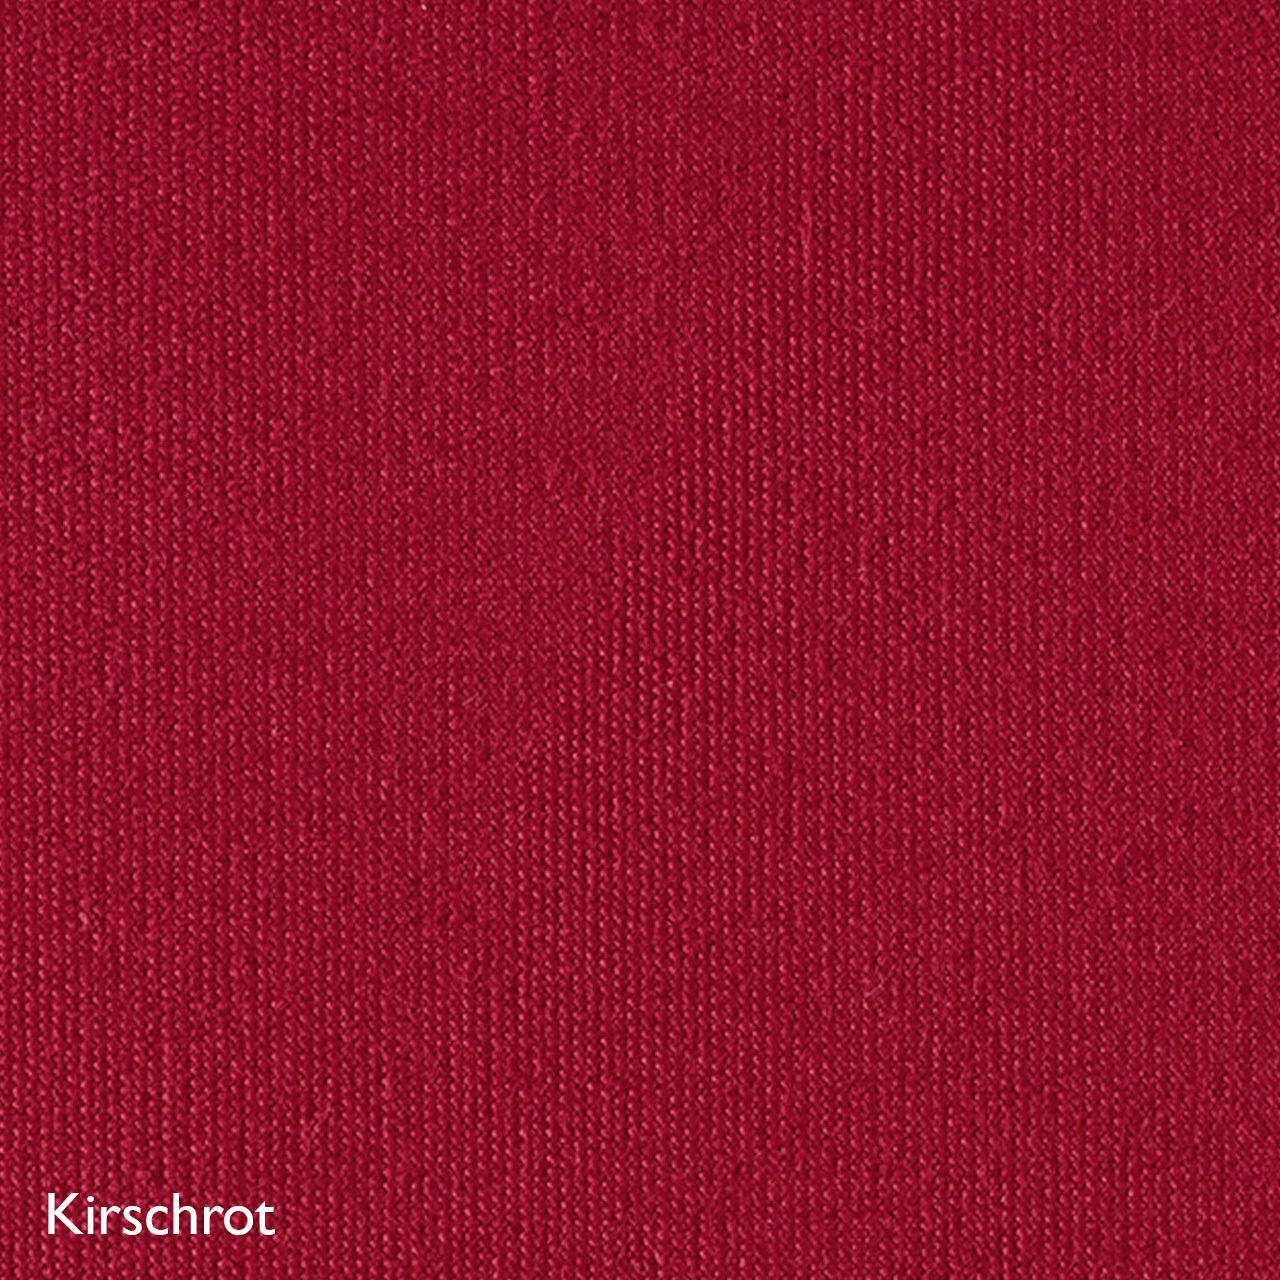 Weishäupl Farbkacheln Kirschrot